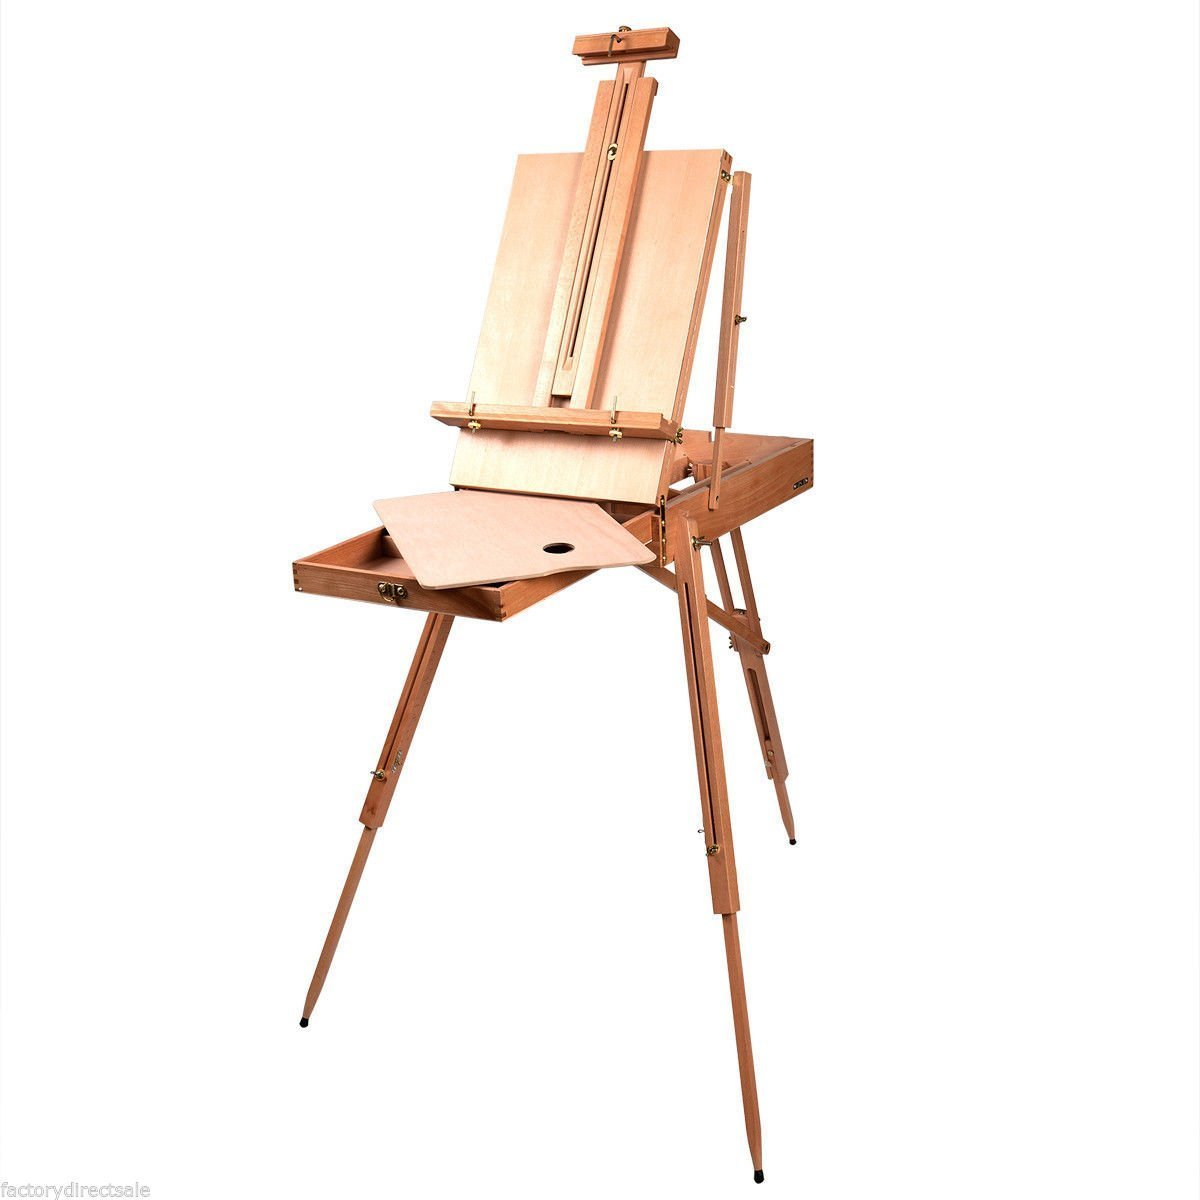 Shop4Omni French Style Portable Tripod/Desktop Wooden Artist Easel w Carry Strap